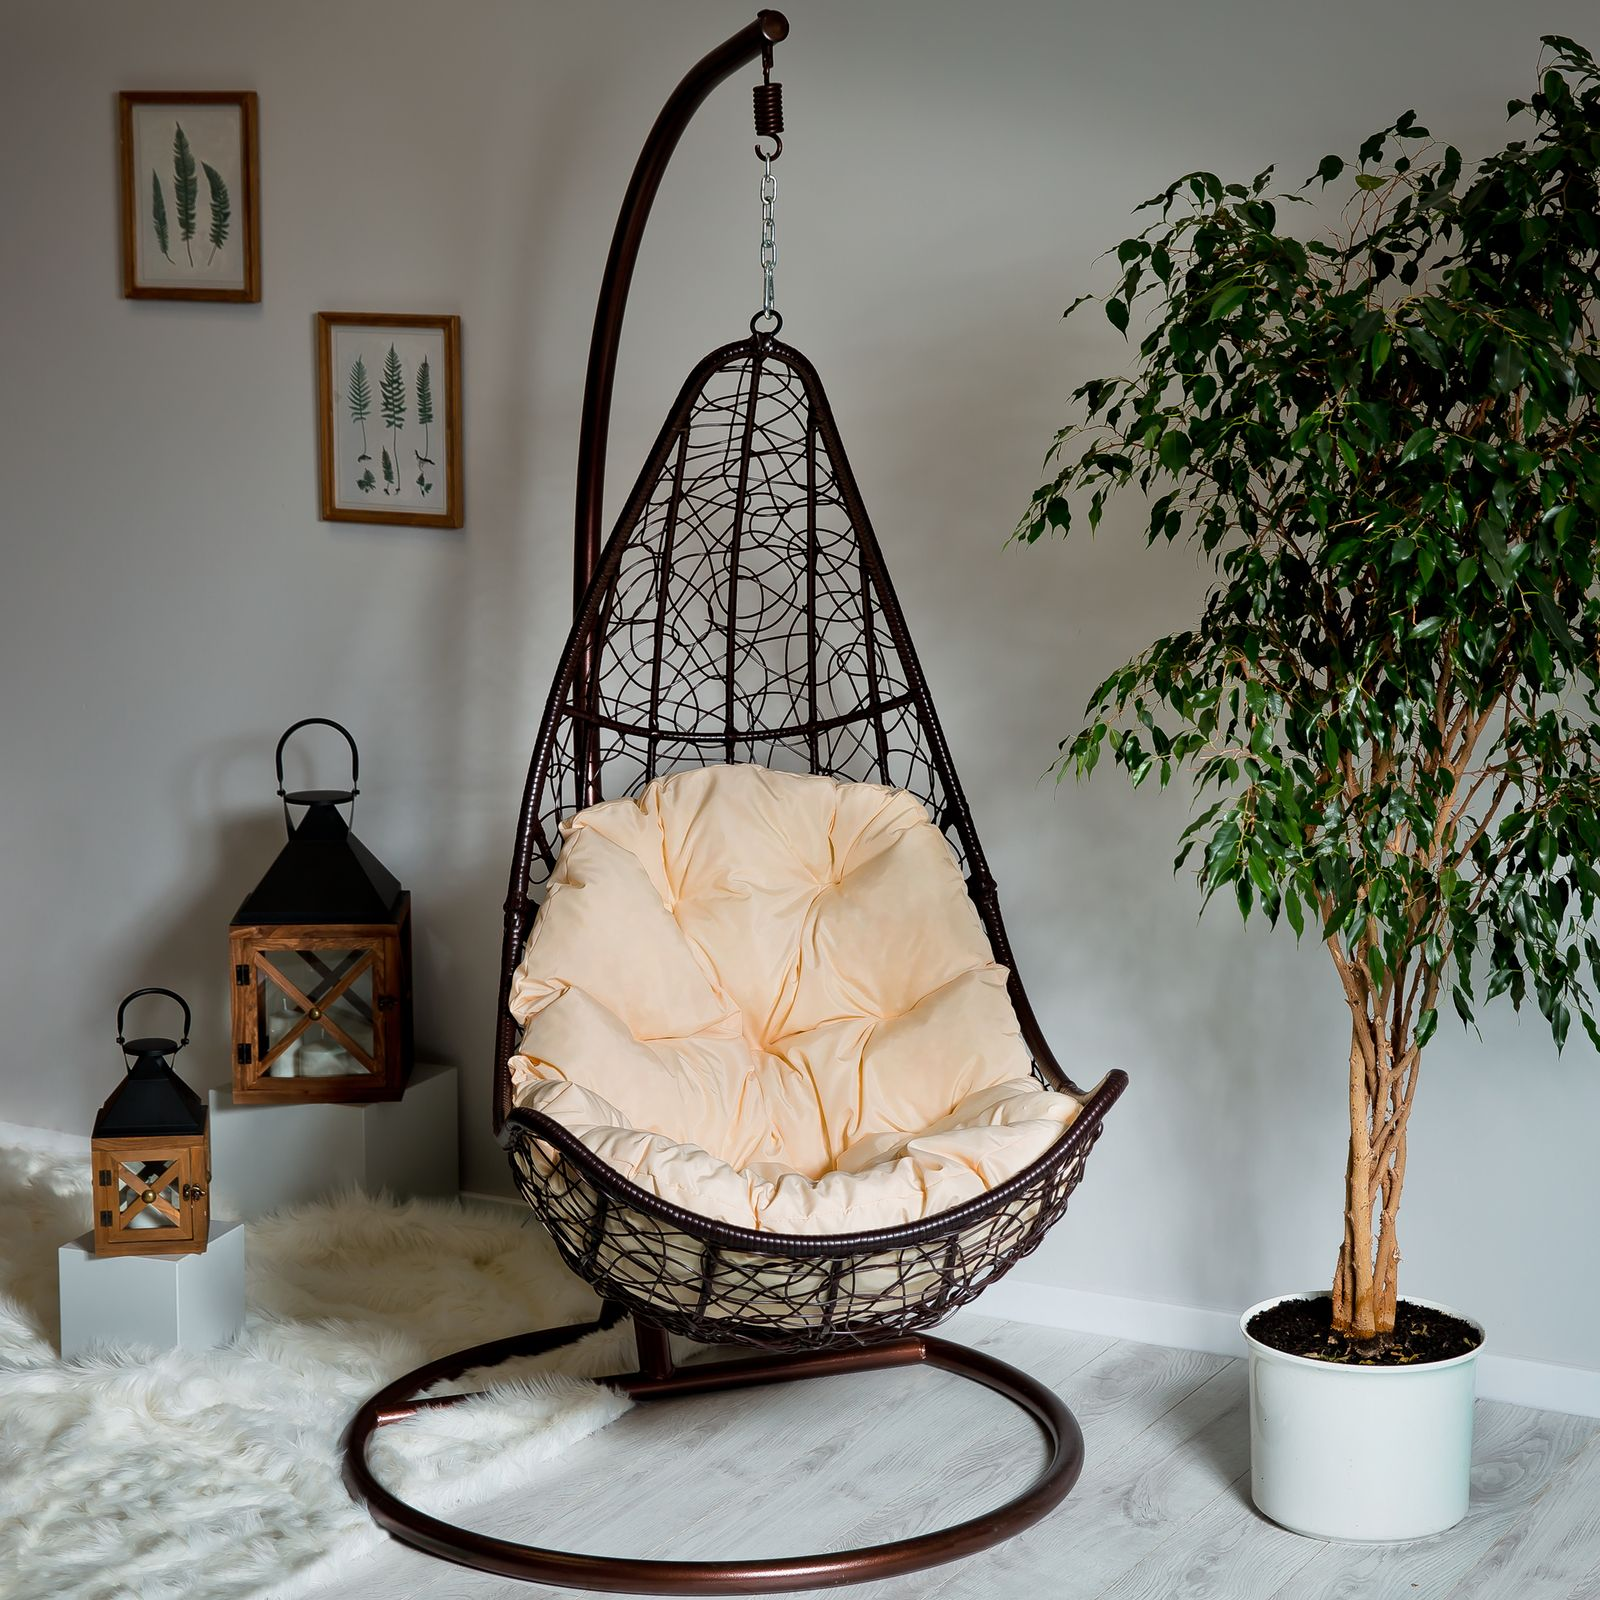 Cojín trapezoidal para silla colgante D031-05CW 144 x 90/64 x 10/12 cm PATIO